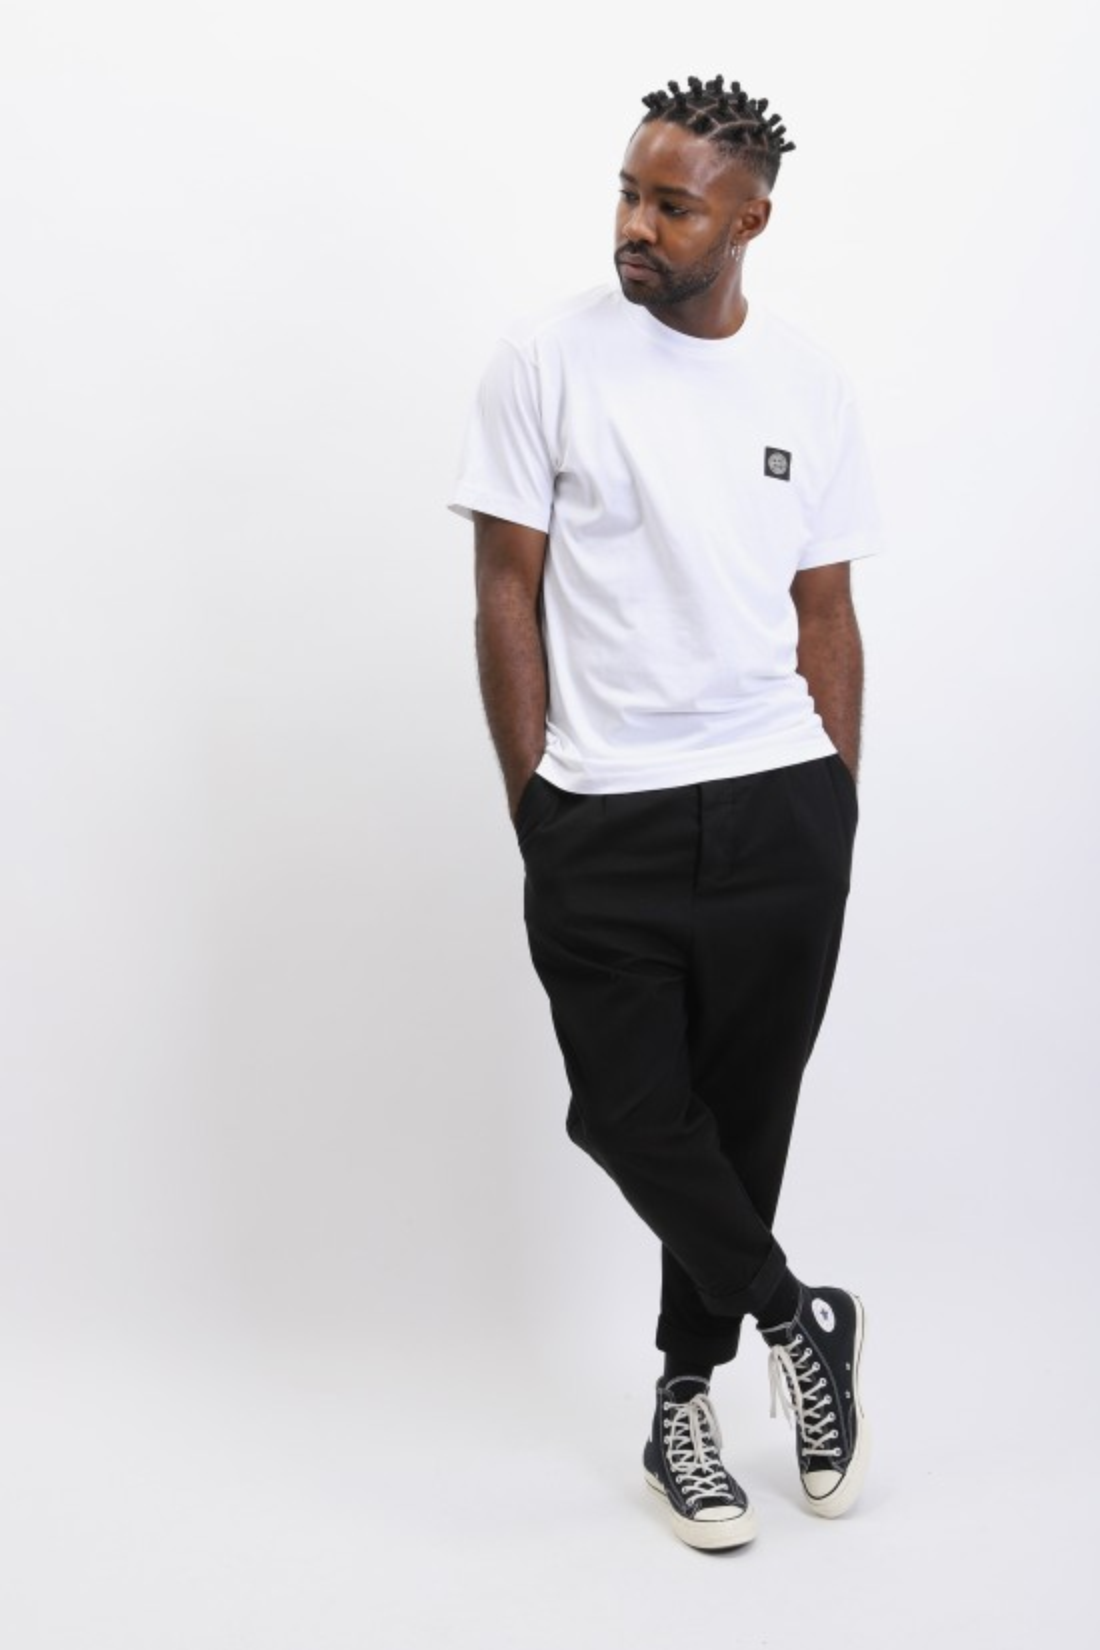 STONE ISLAND / 24113 logo t shirt v0001 Bianco